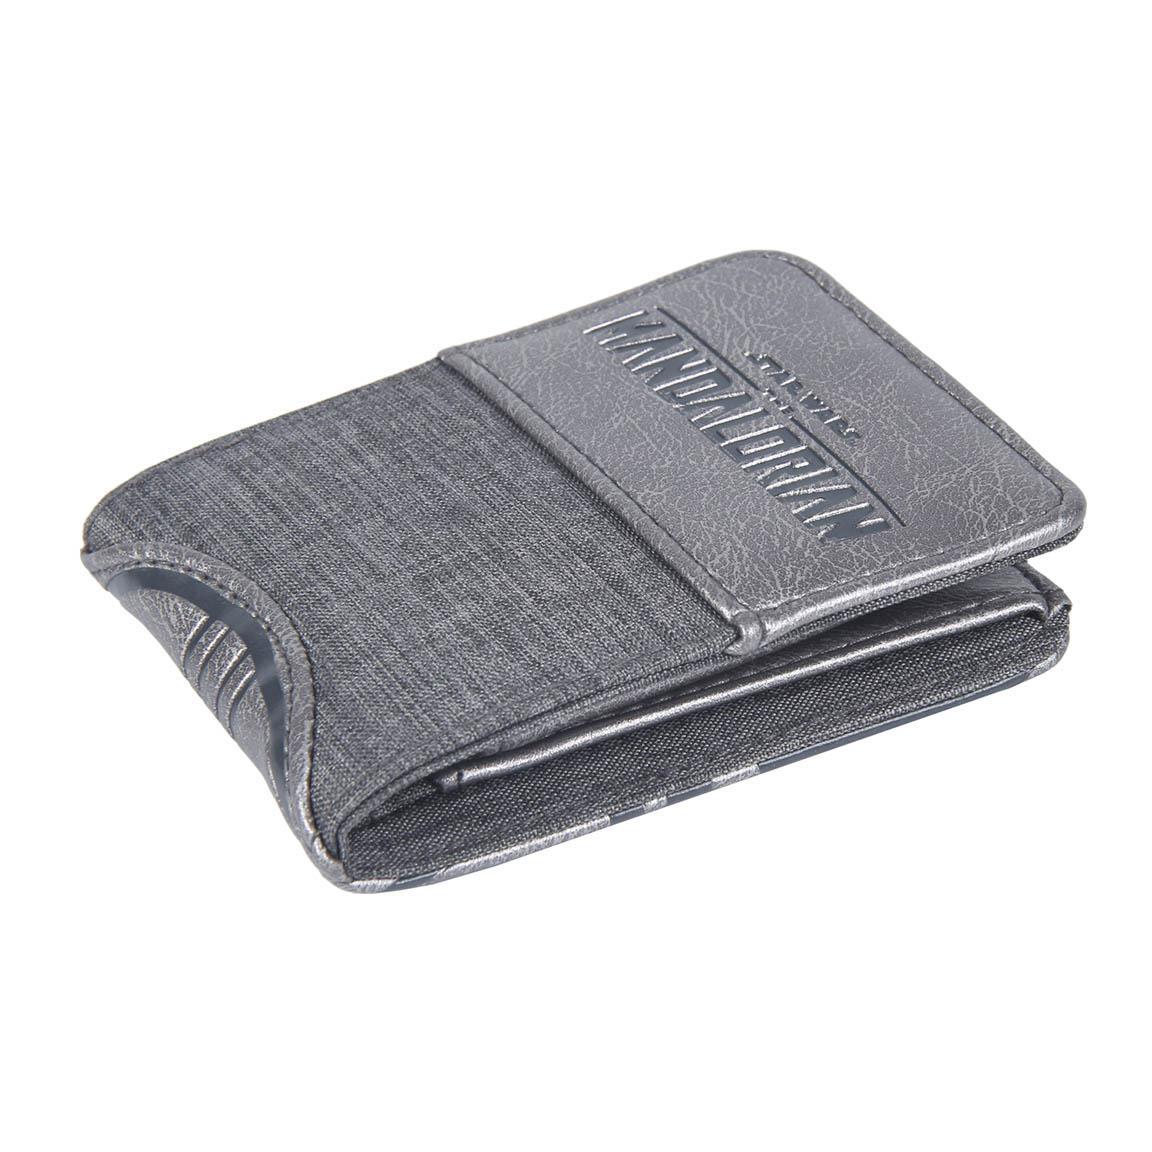 The Mandalorian wallet